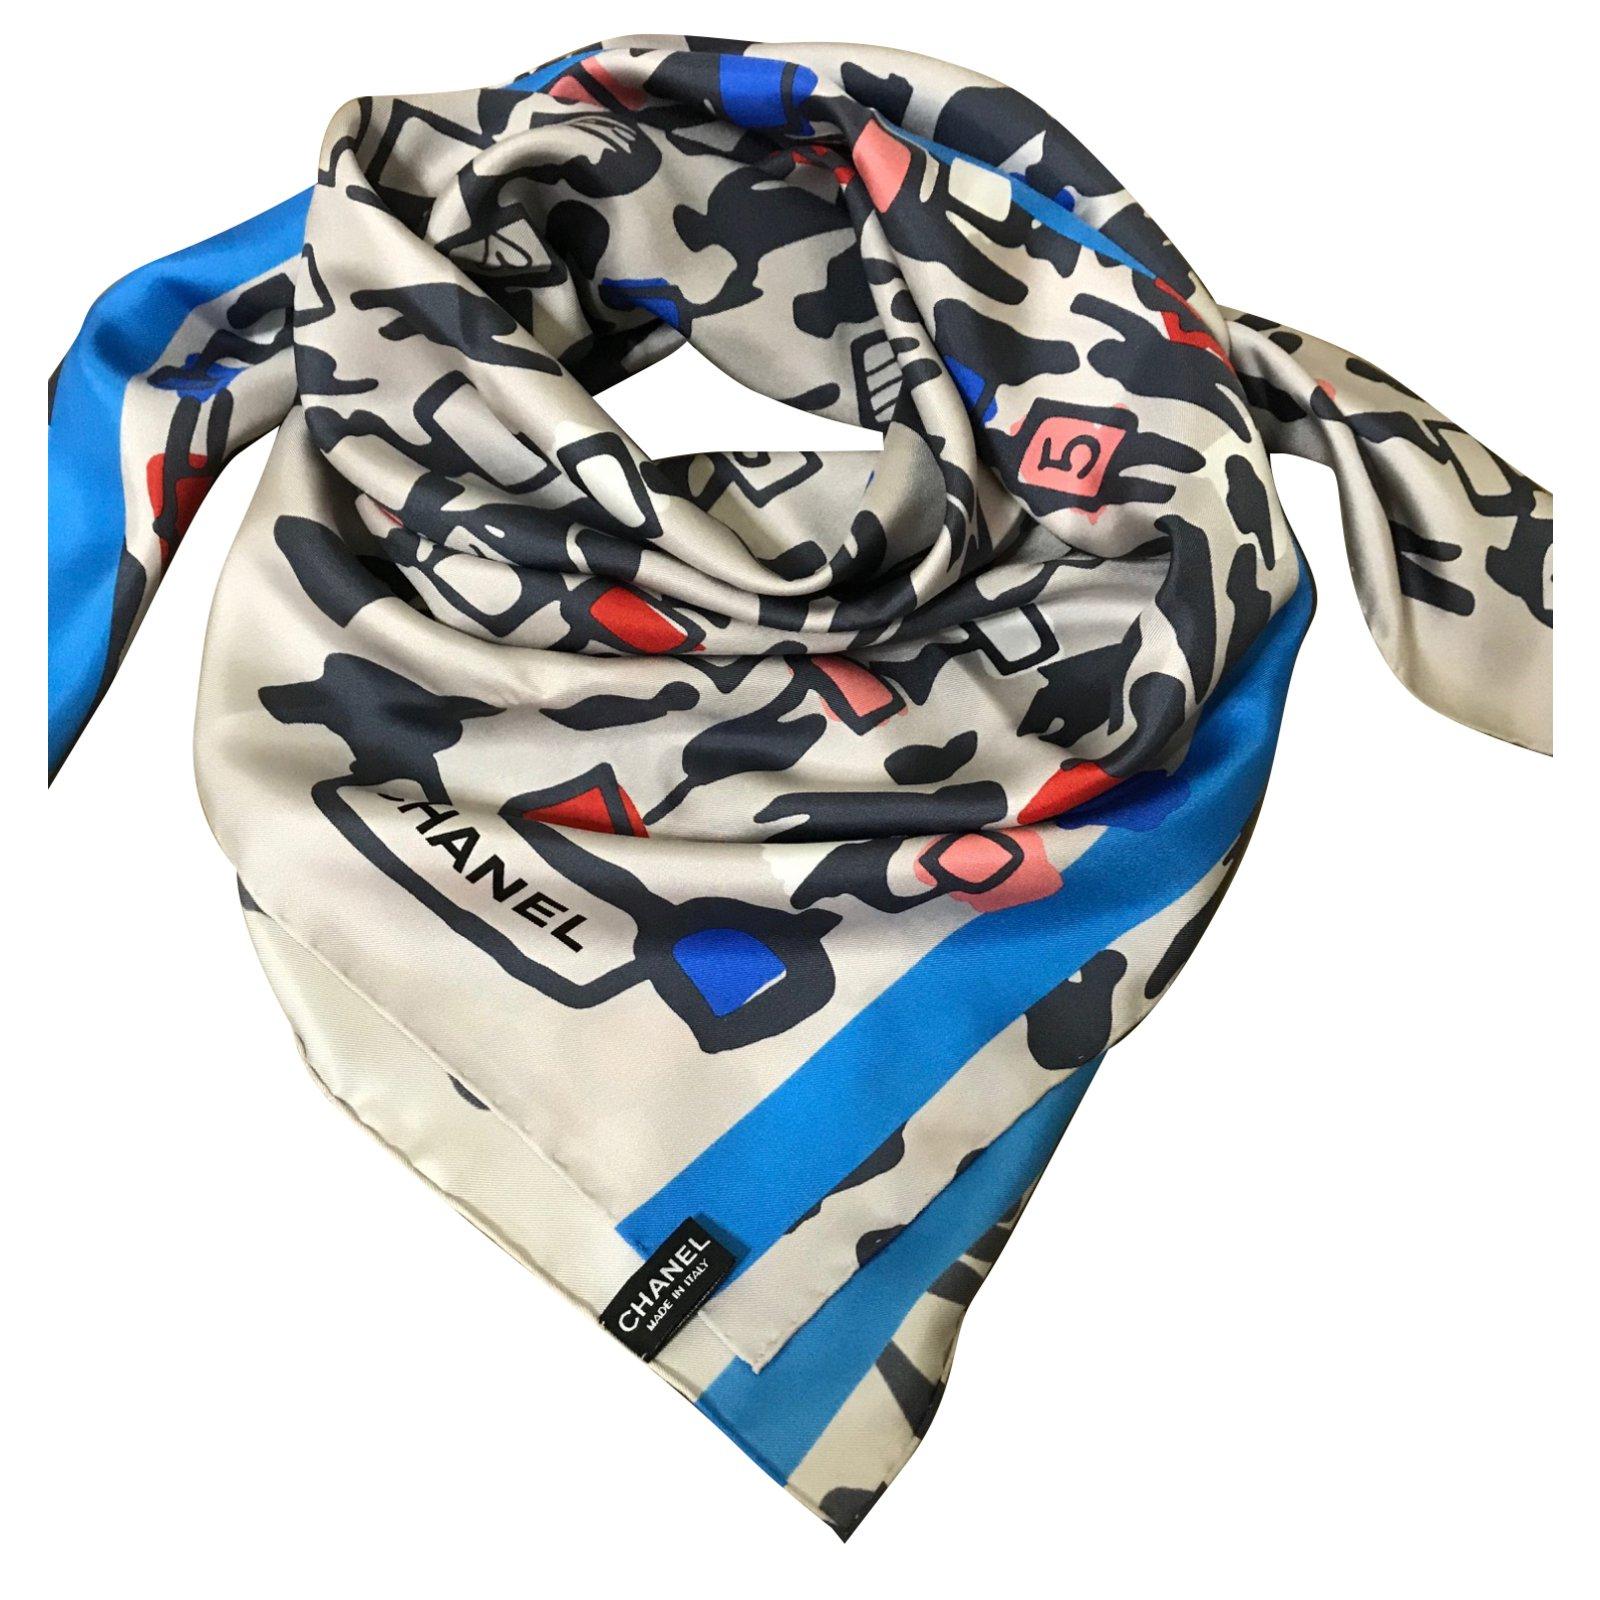 Foulards Chanel Foulard Chanel Soie Gris ref.48779 - Joli Closet 325d57fca80